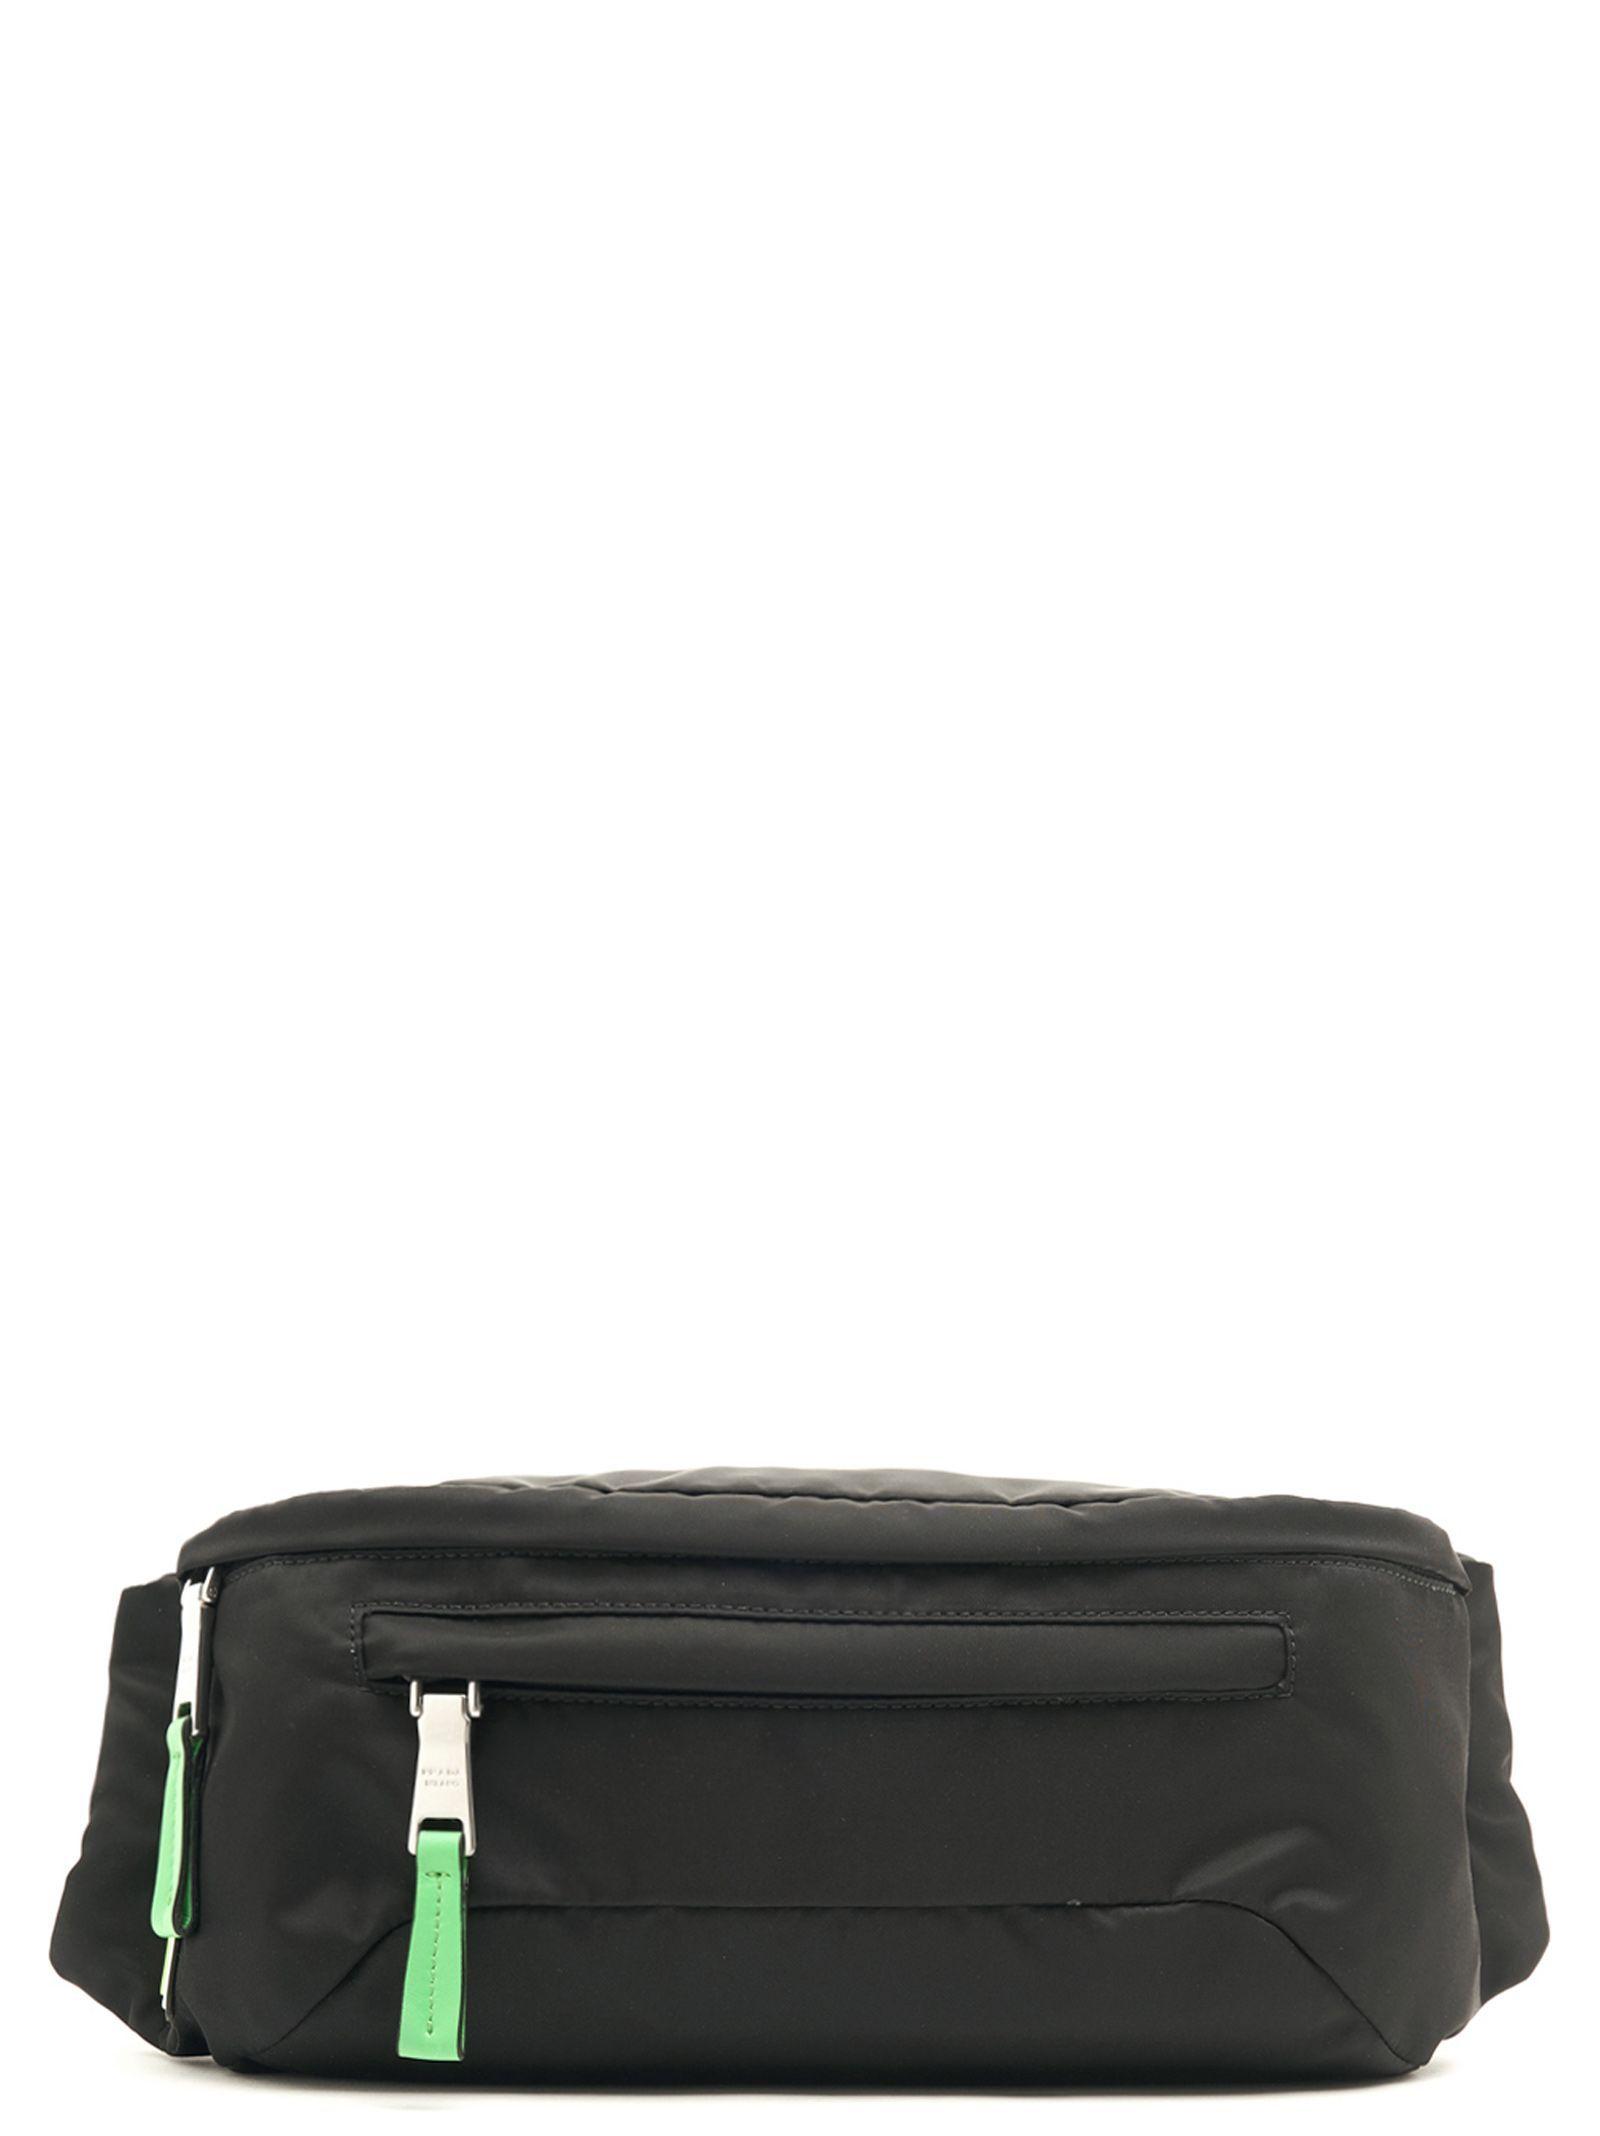 40d38e832d76  prada  bags  belt bags  nylon Prada Bag Black